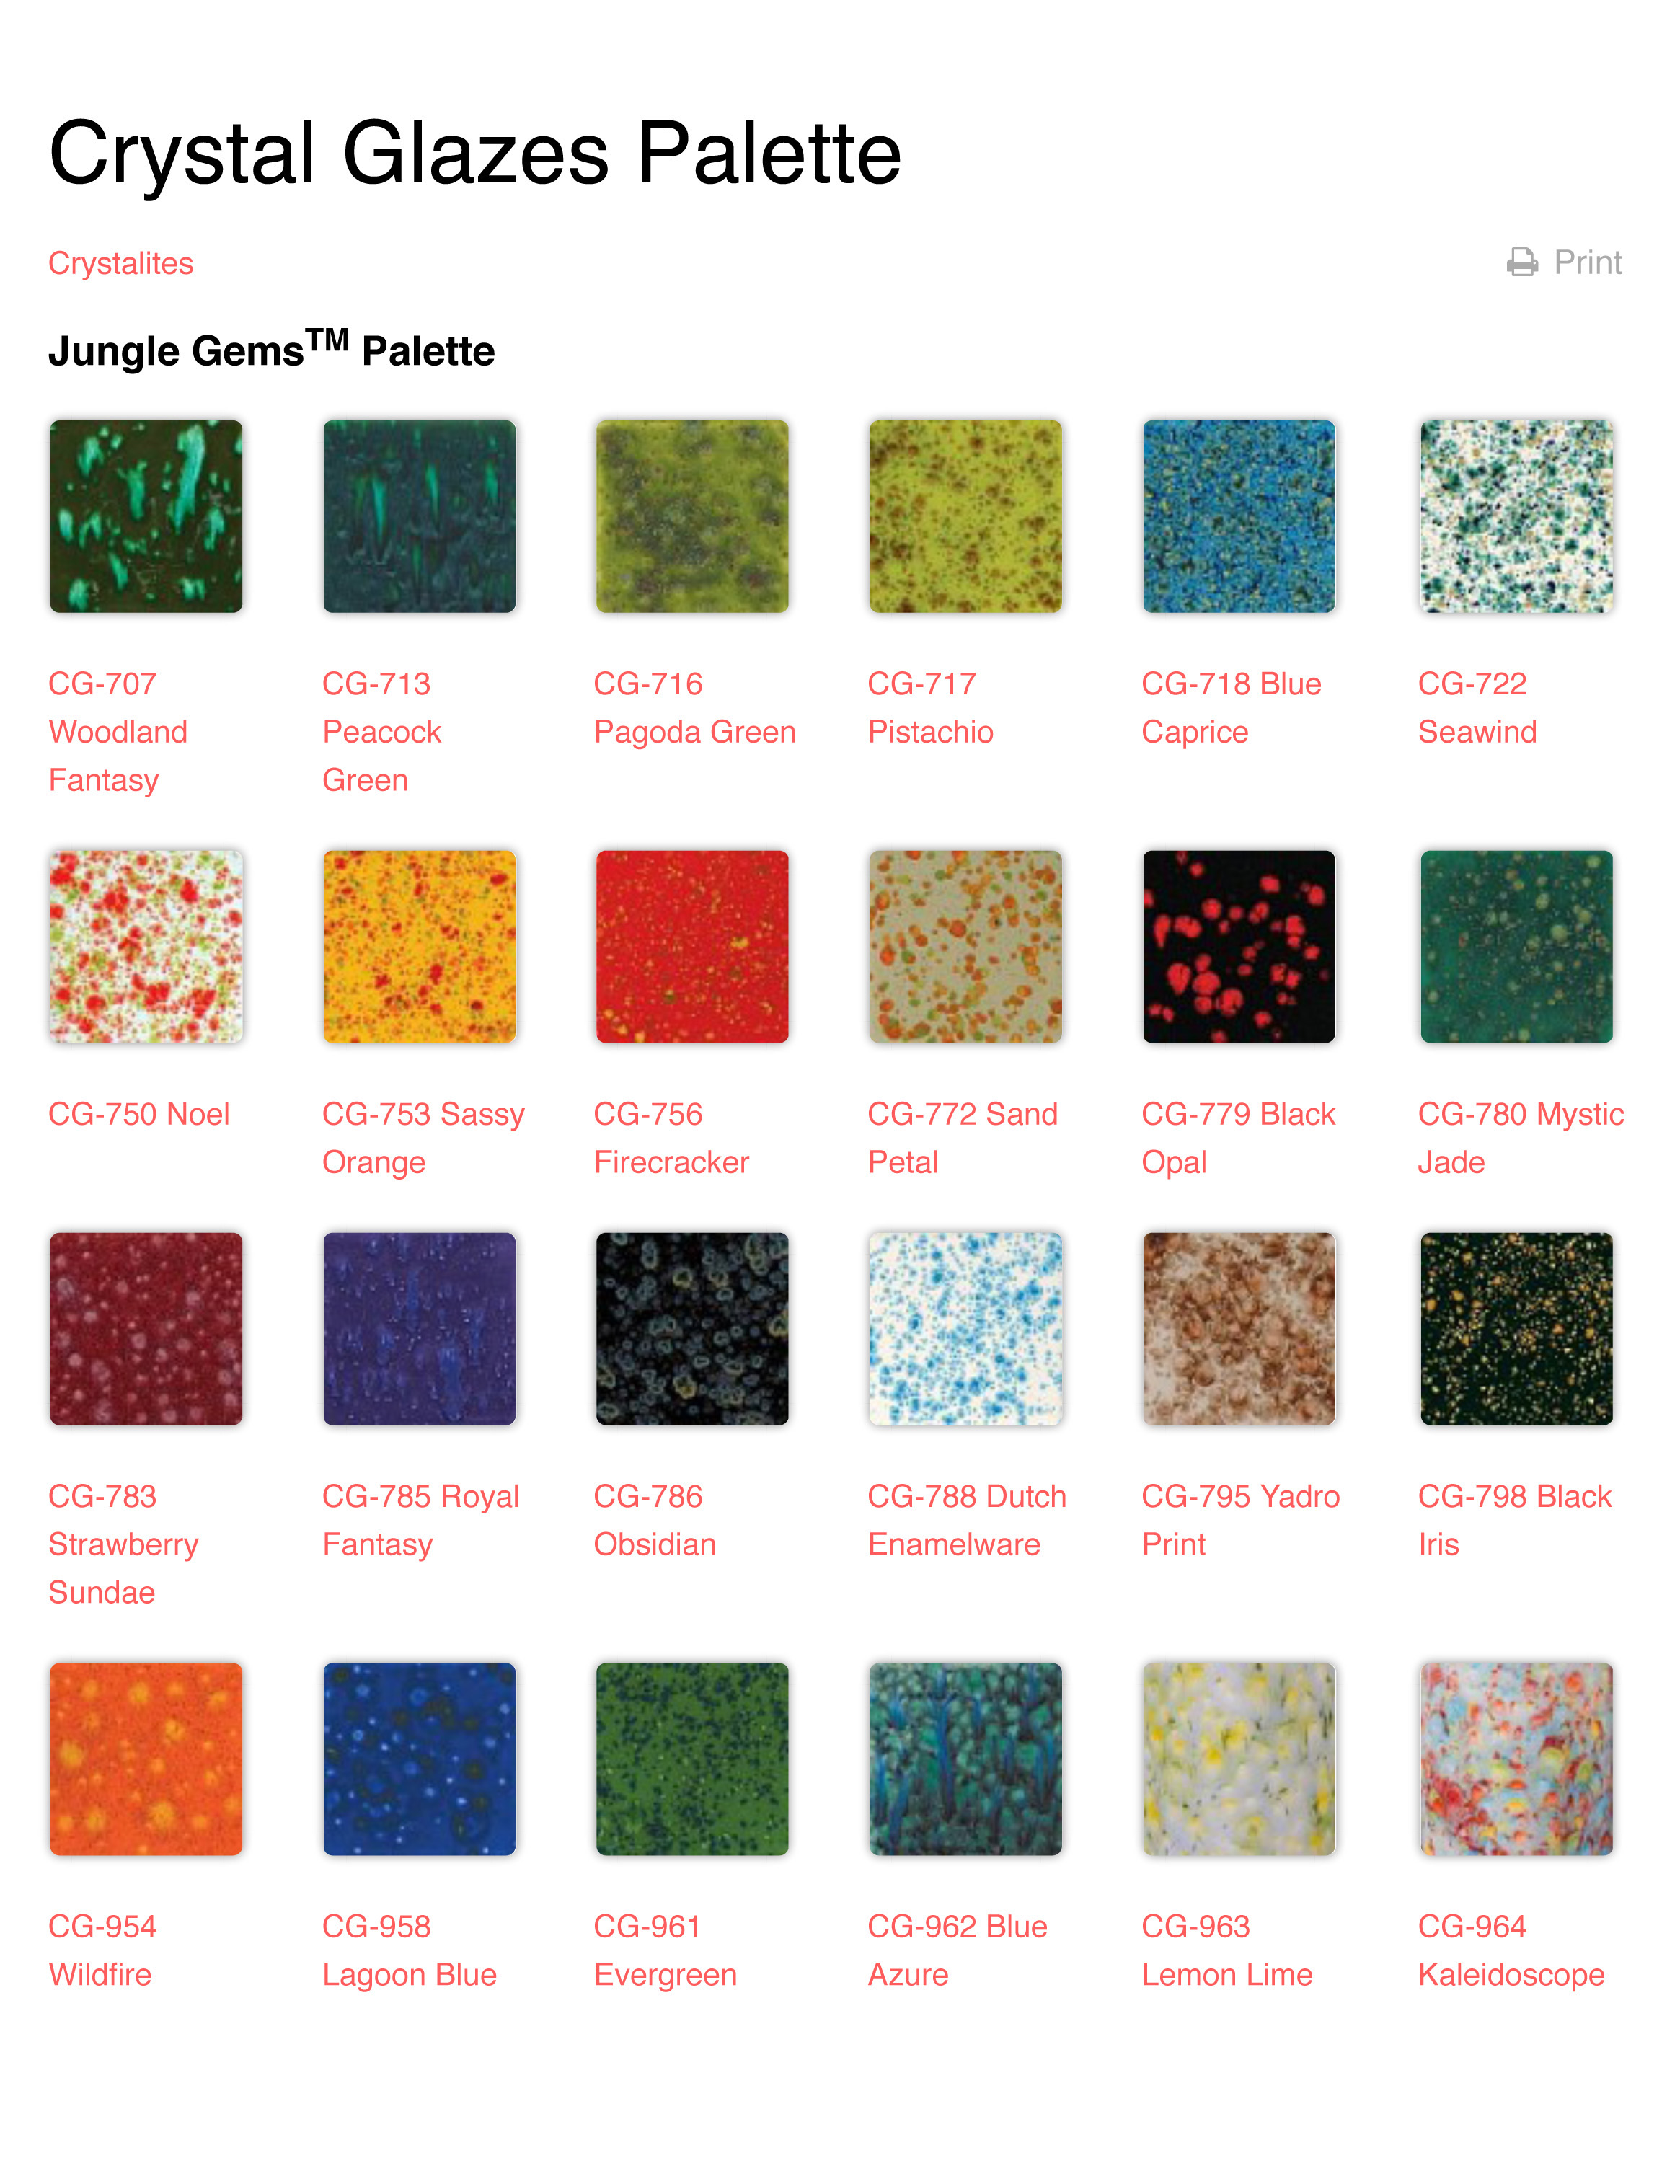 Crystal Glazes Palette